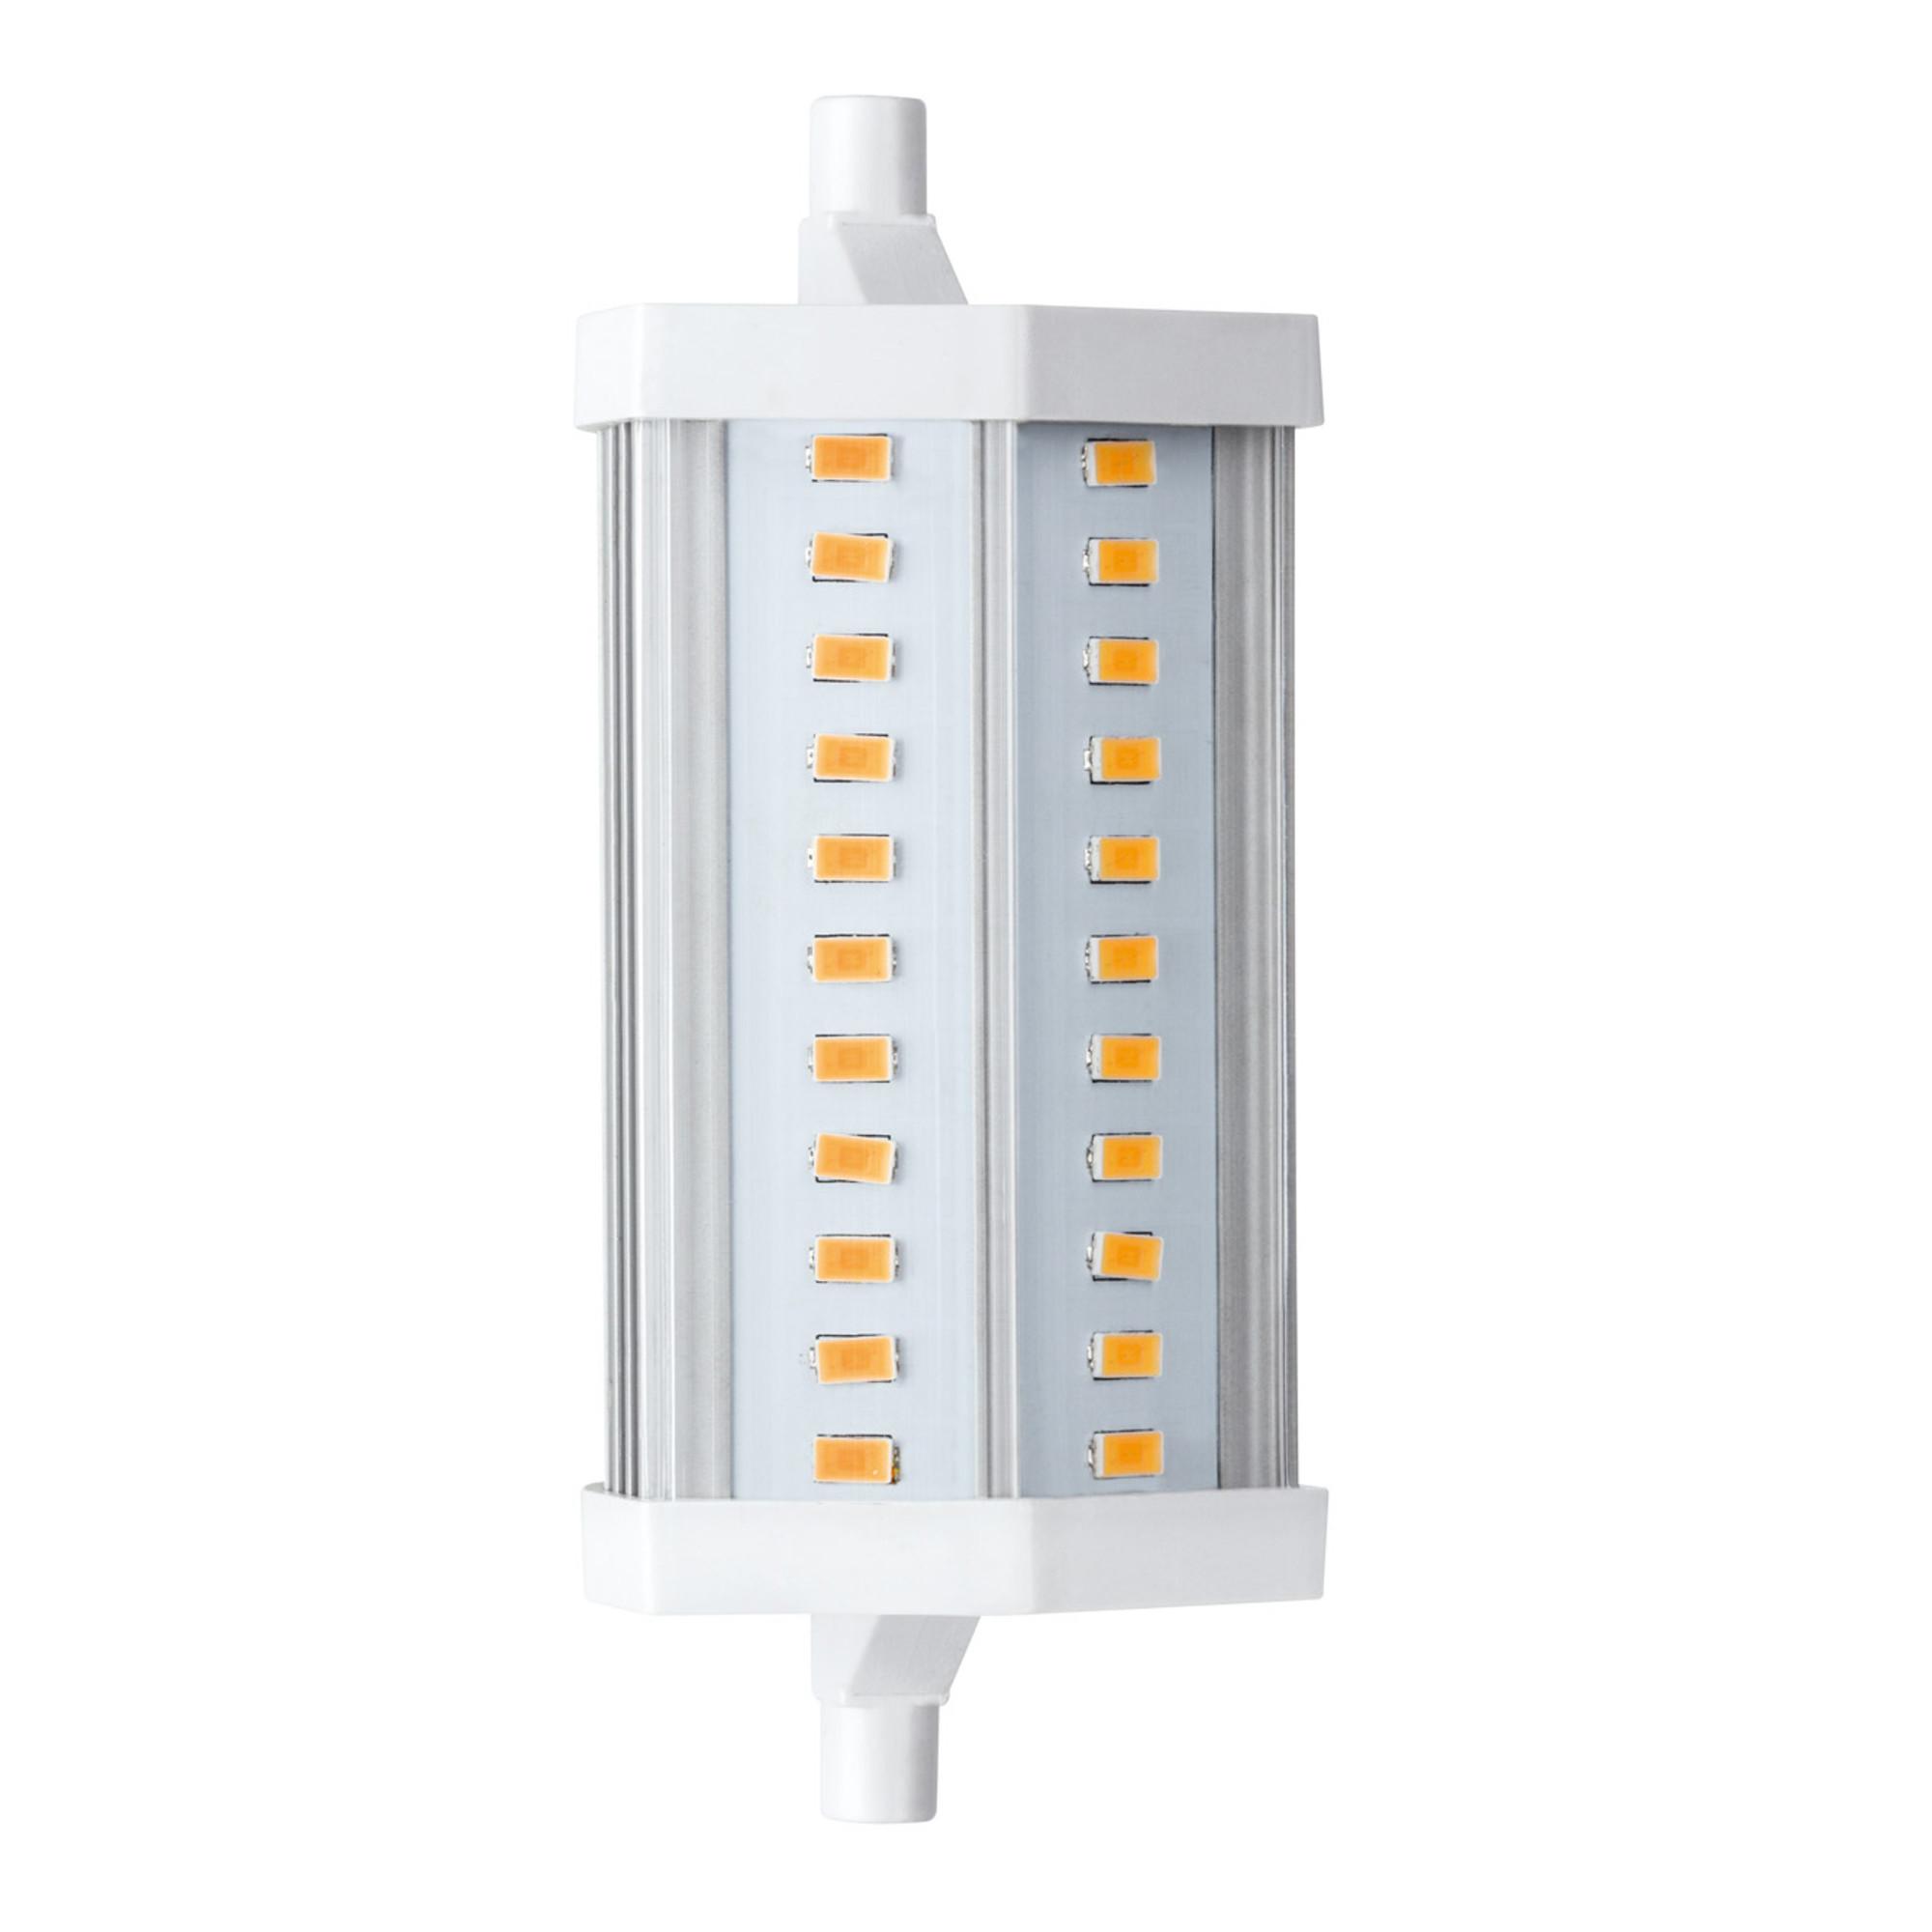 Лампа светодиодная Paulmann 28212 R7S 806 Лм теплый свет